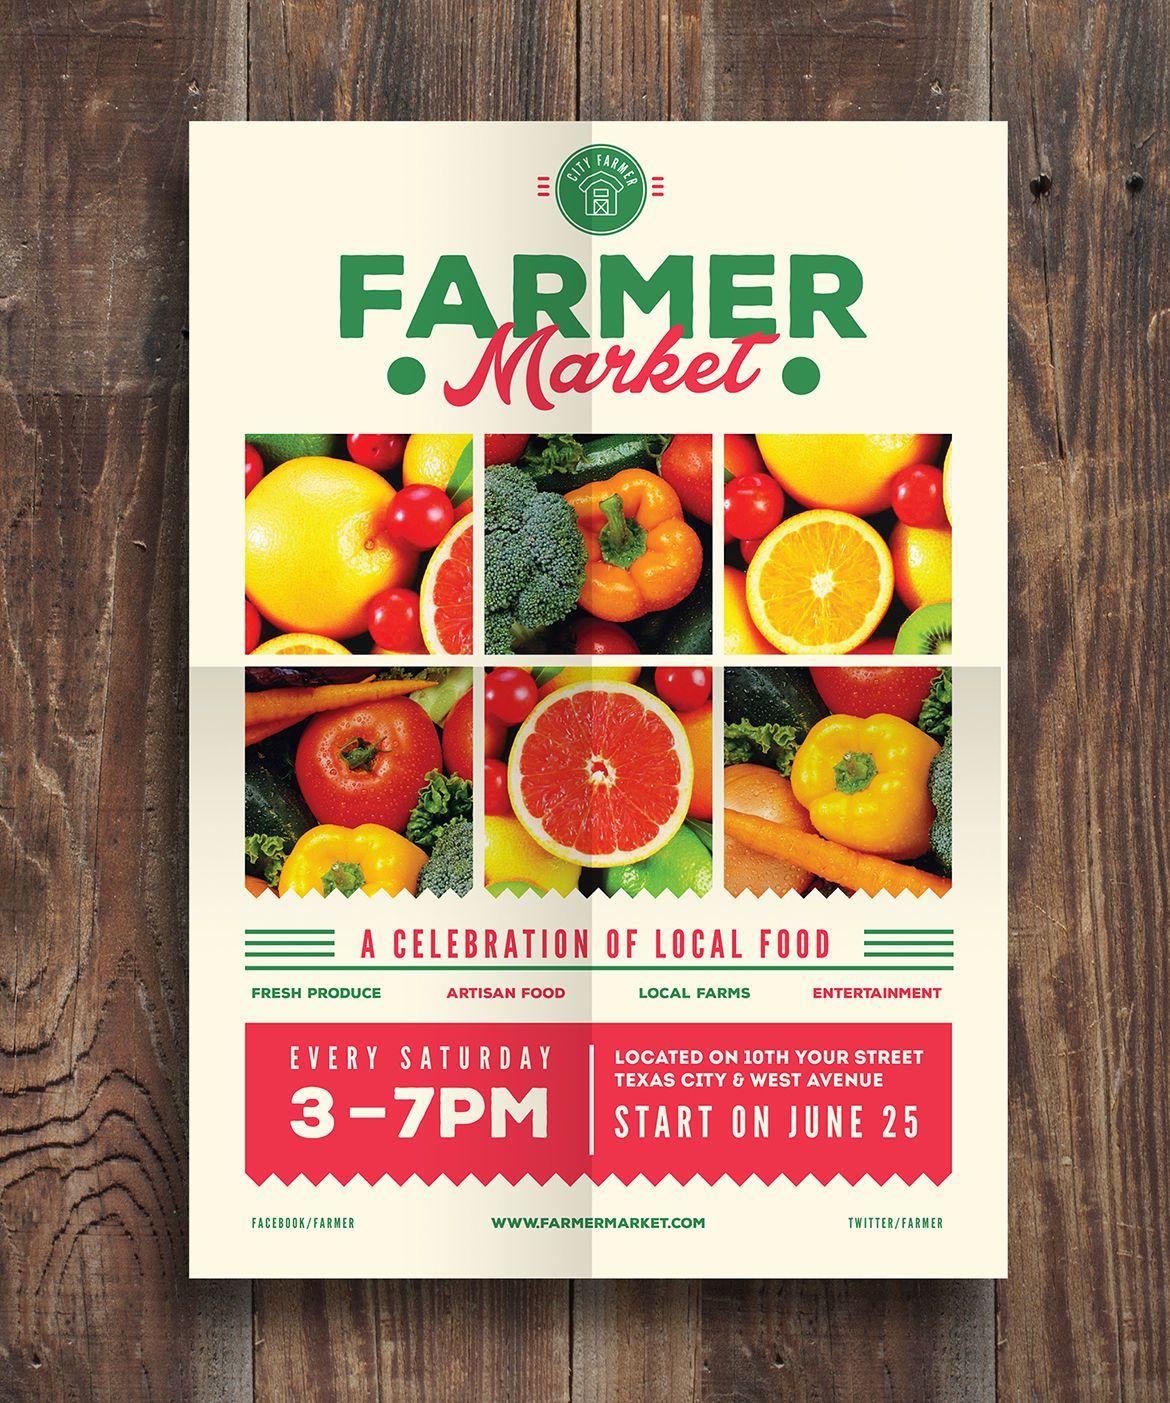 farmer market event flyer template ai psd nice ad farmer market event flyer template ai psd